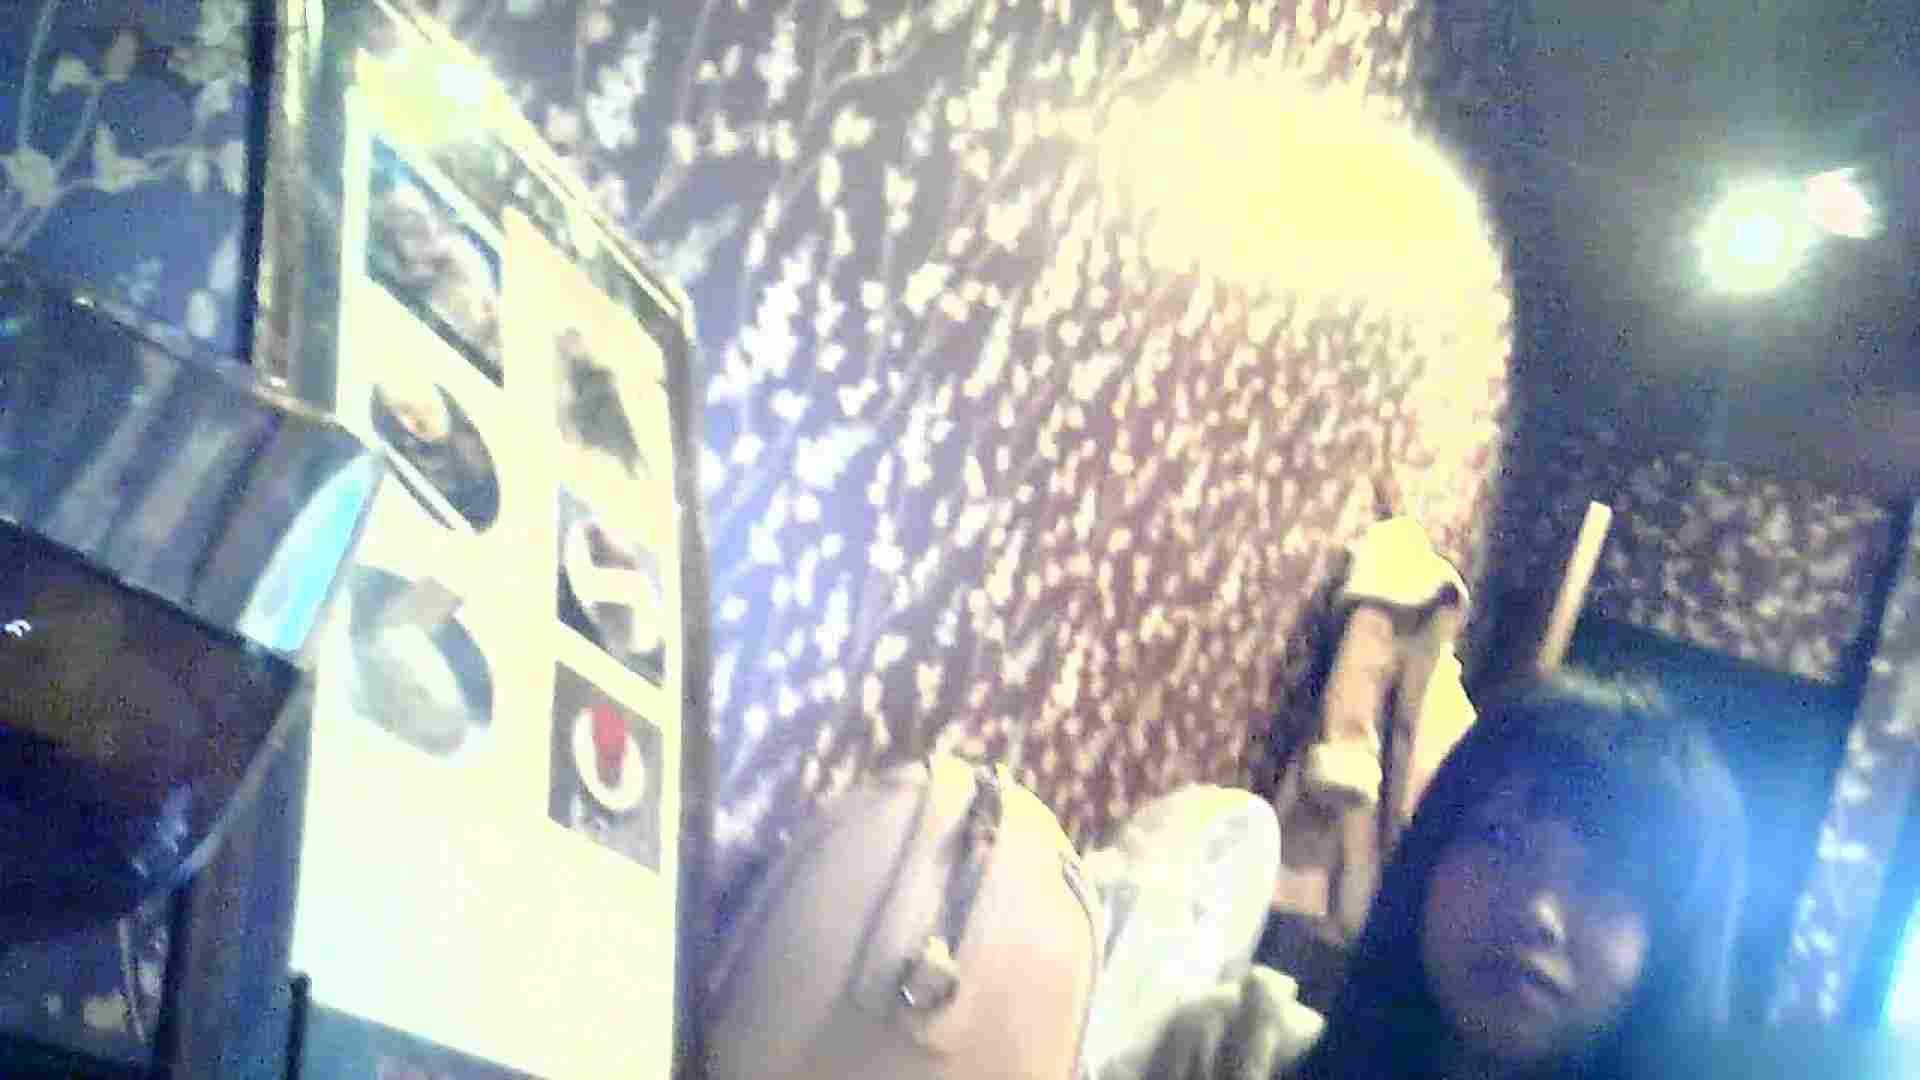 ▲2017_05位▲ 学園アイドル美人女子大生!❶4人厳選詰合せVol.49 人気作   女子大生  113画像 33